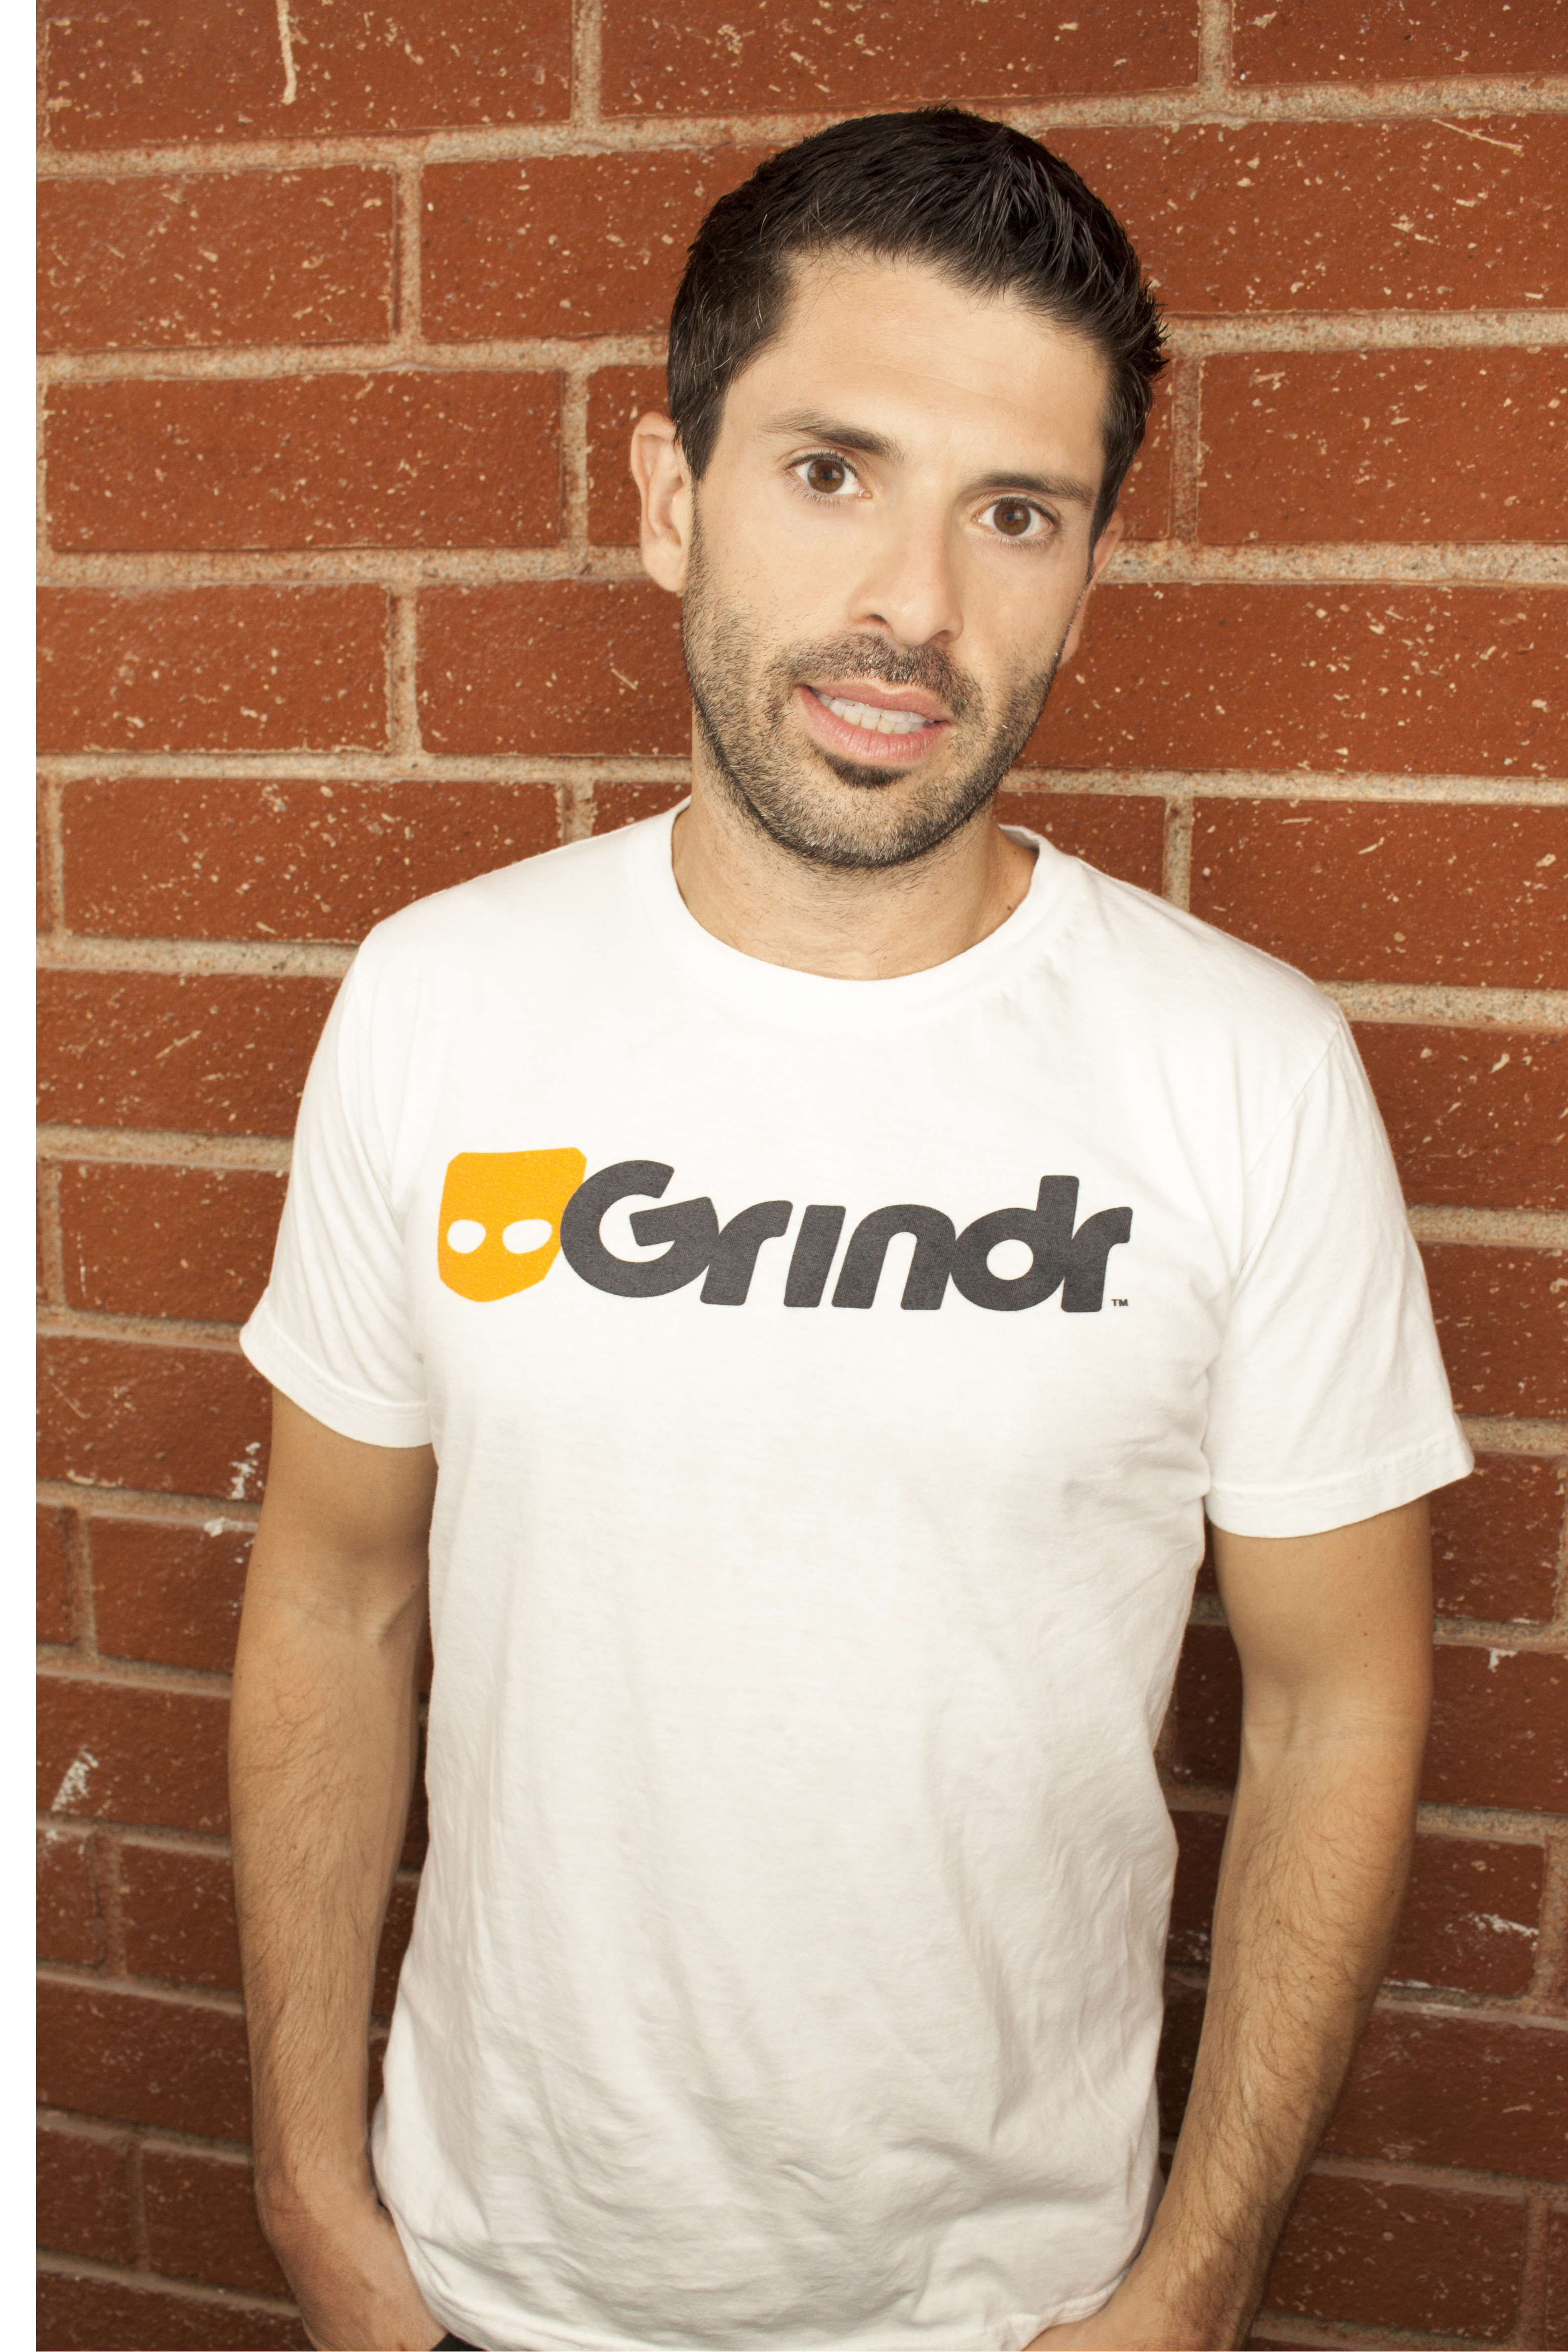 Joel Simkhai, CEO, Grindr